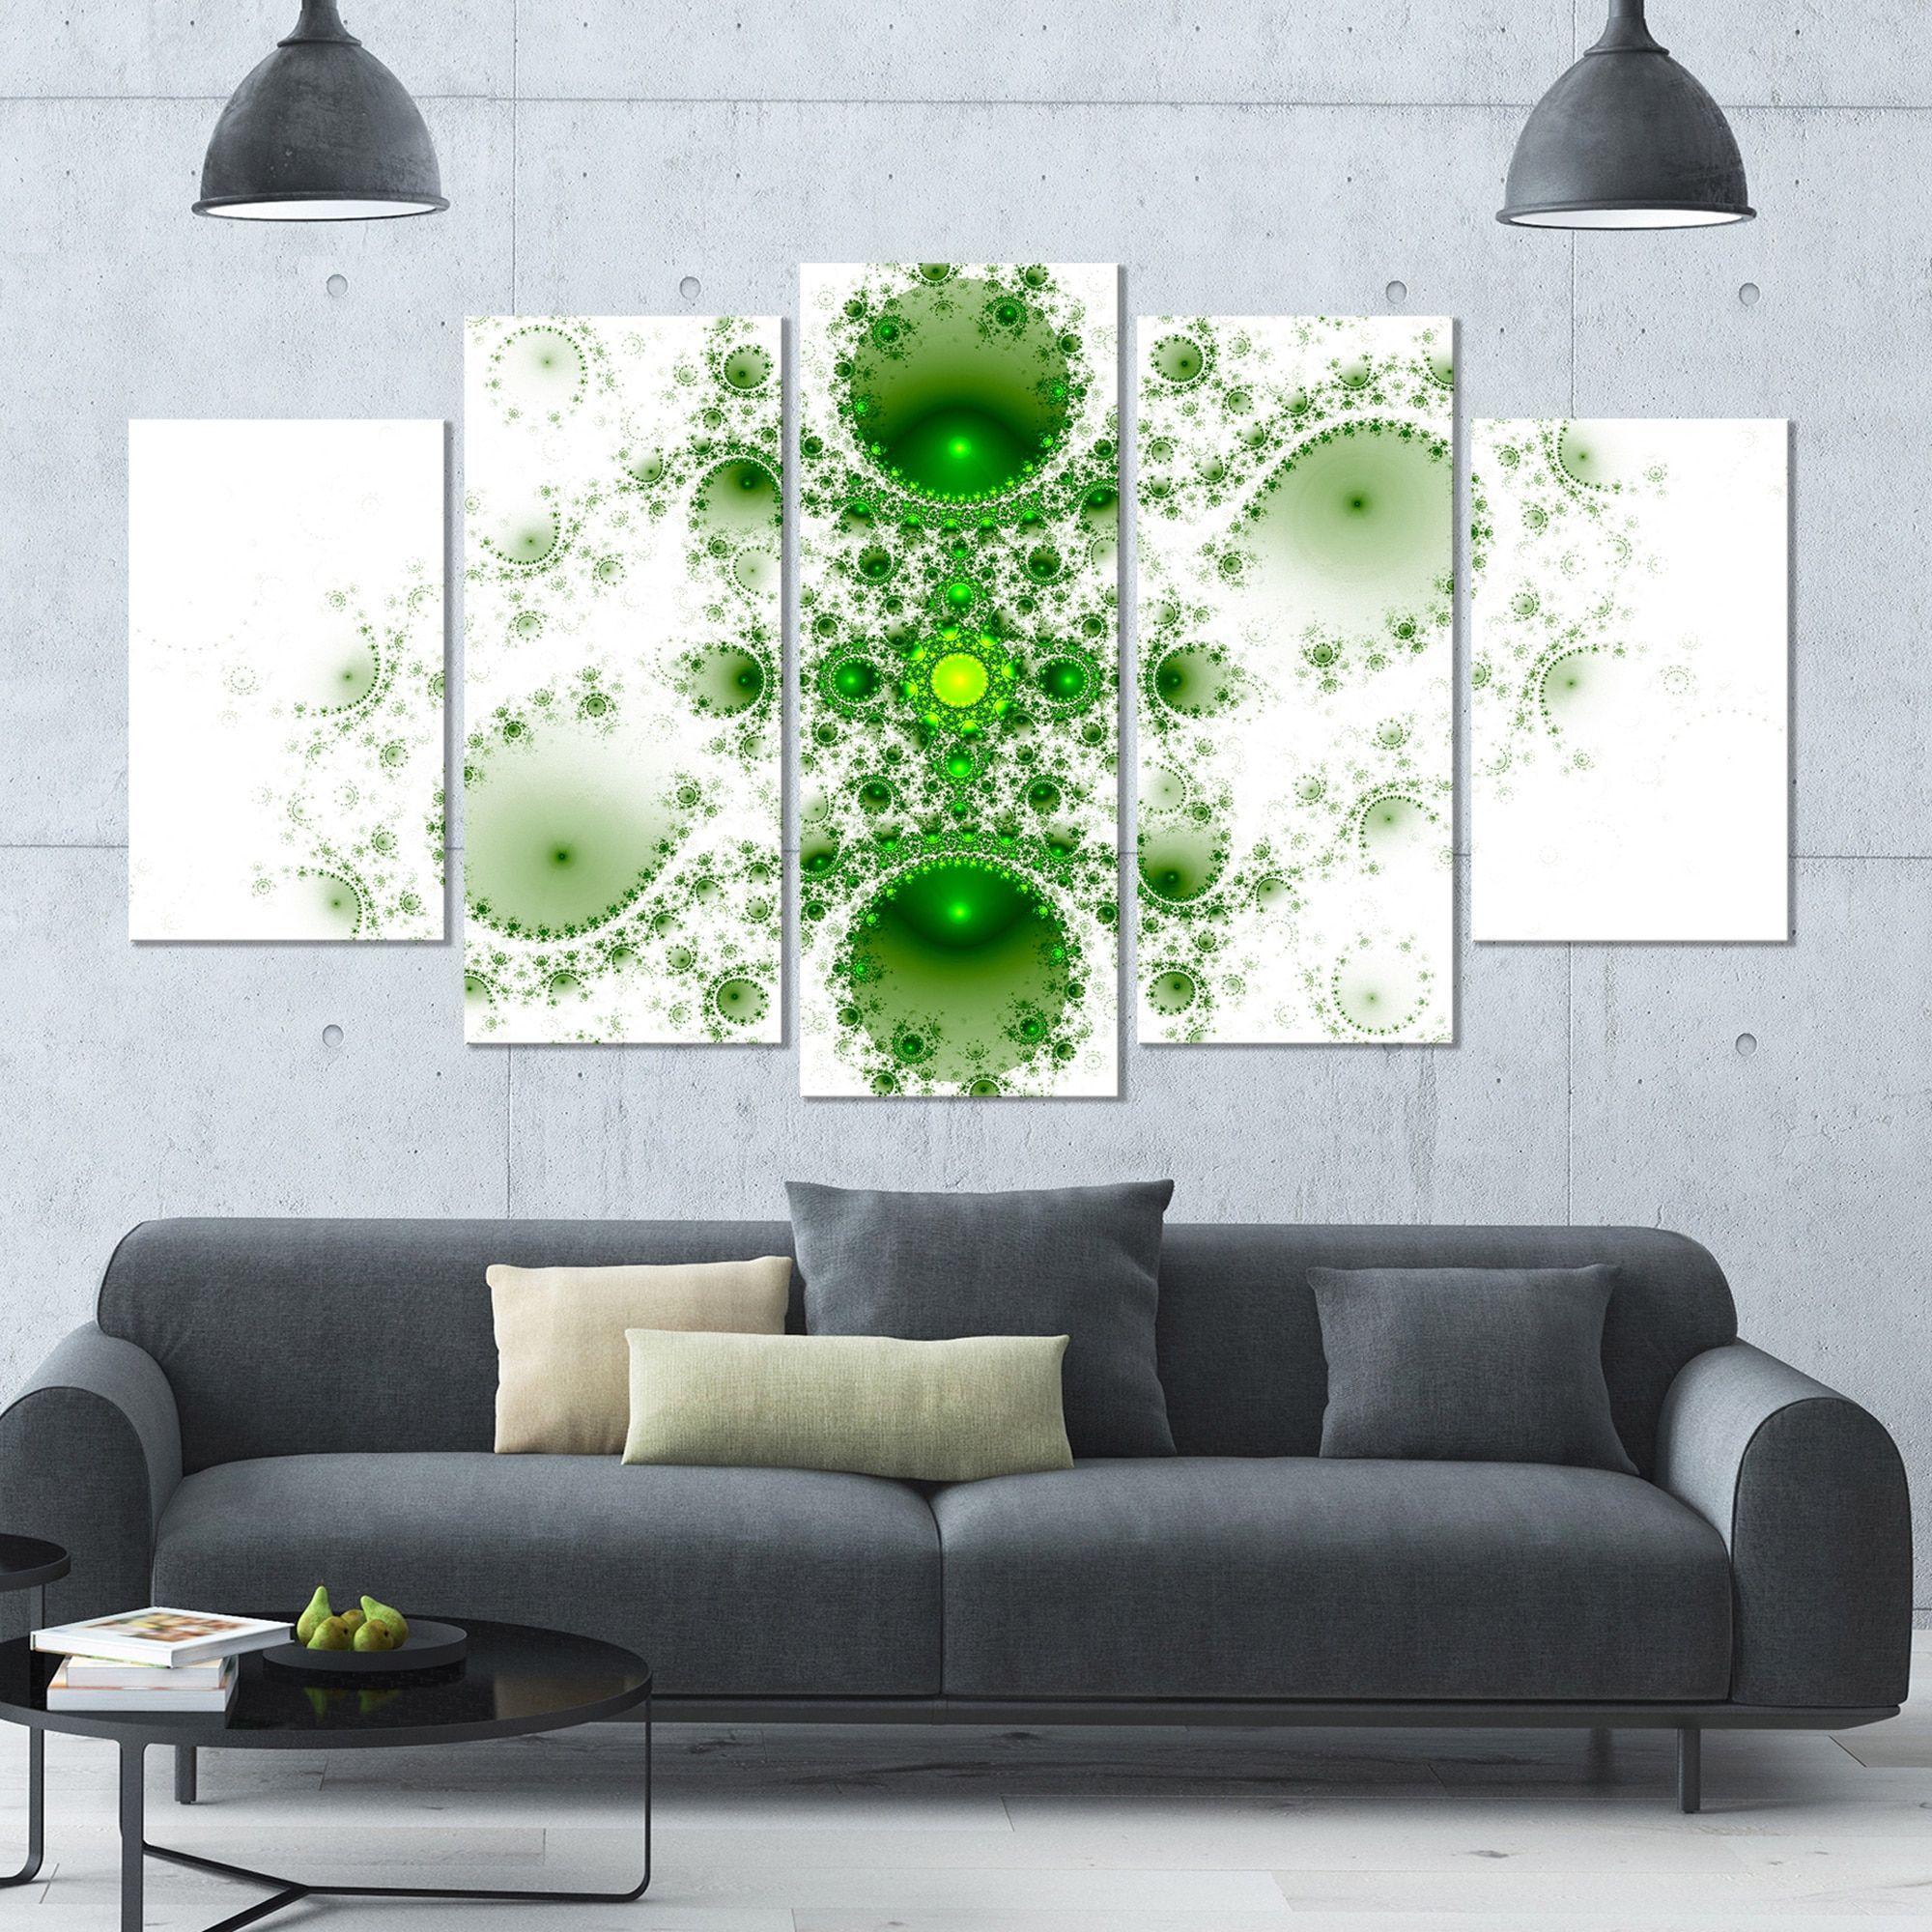 Designart 'Cabalistic Nature Fractal Art' Abstract Wall Art Canvas - 60x32 - 5 Panels Diamond Shape